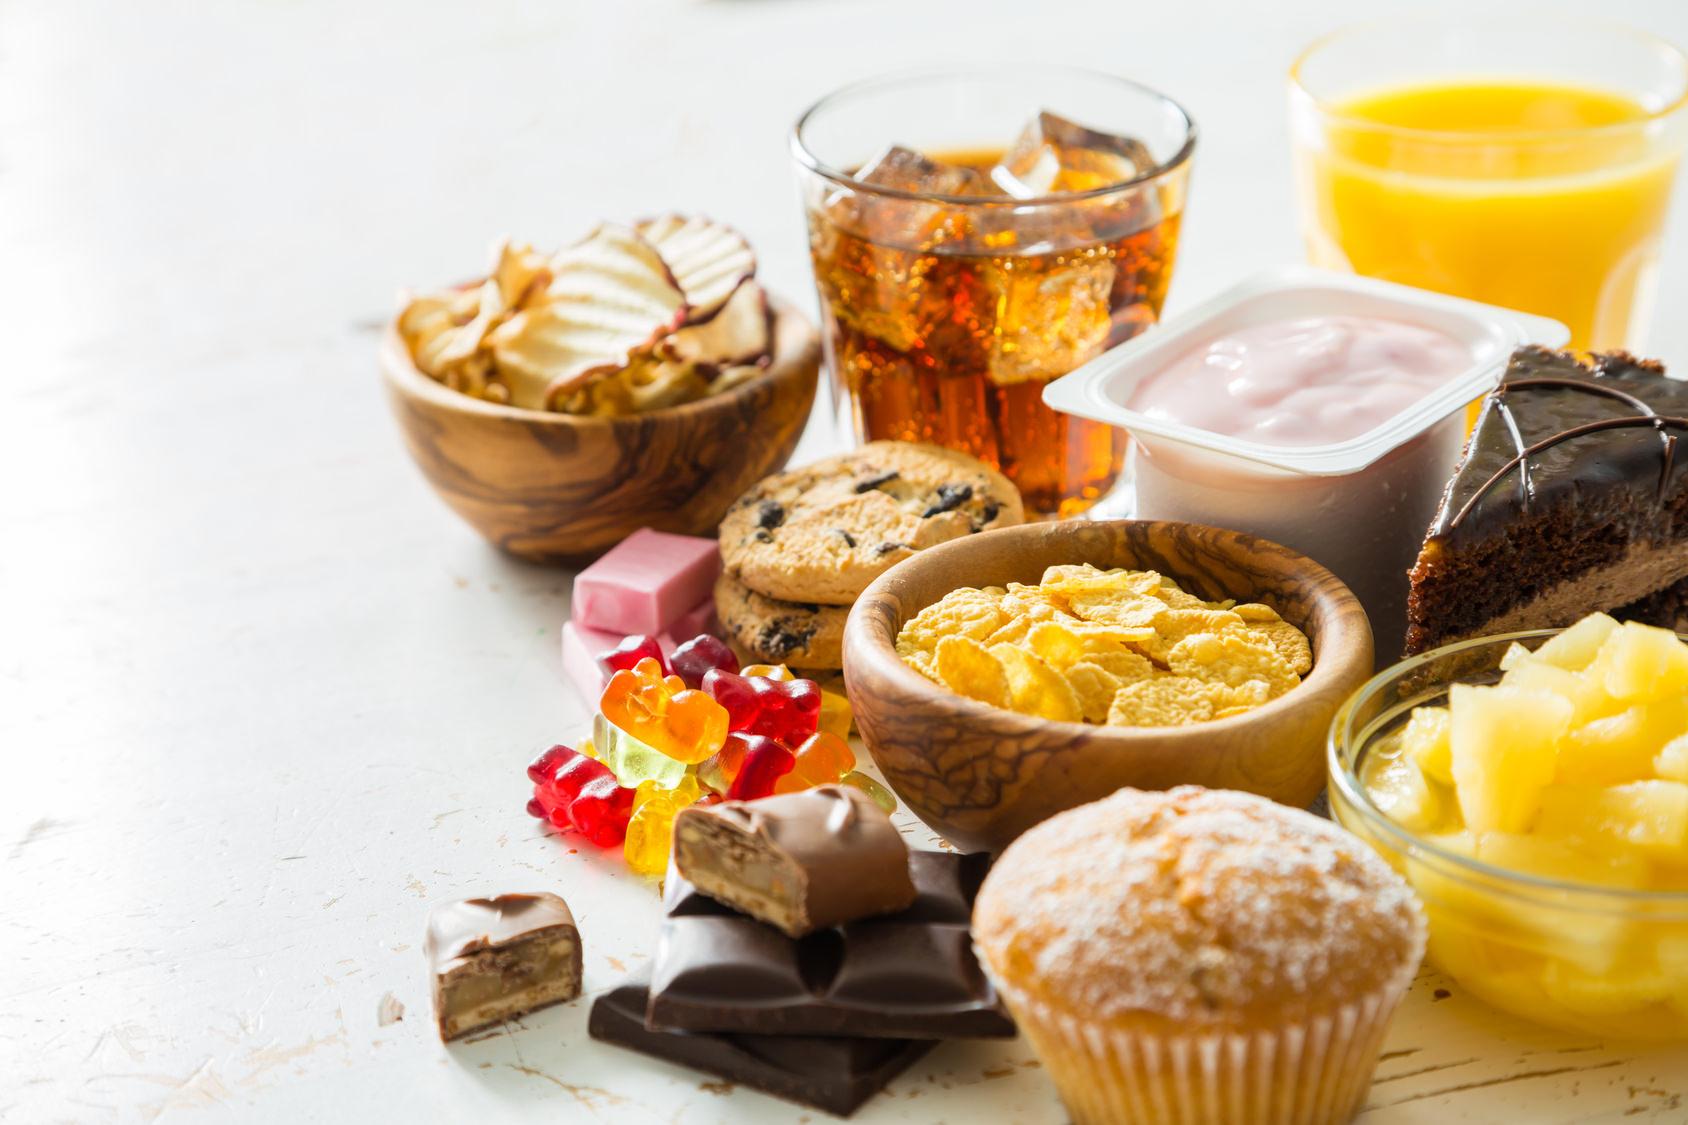 keto diet avoid sugary food unhealthy mydietgoal hd